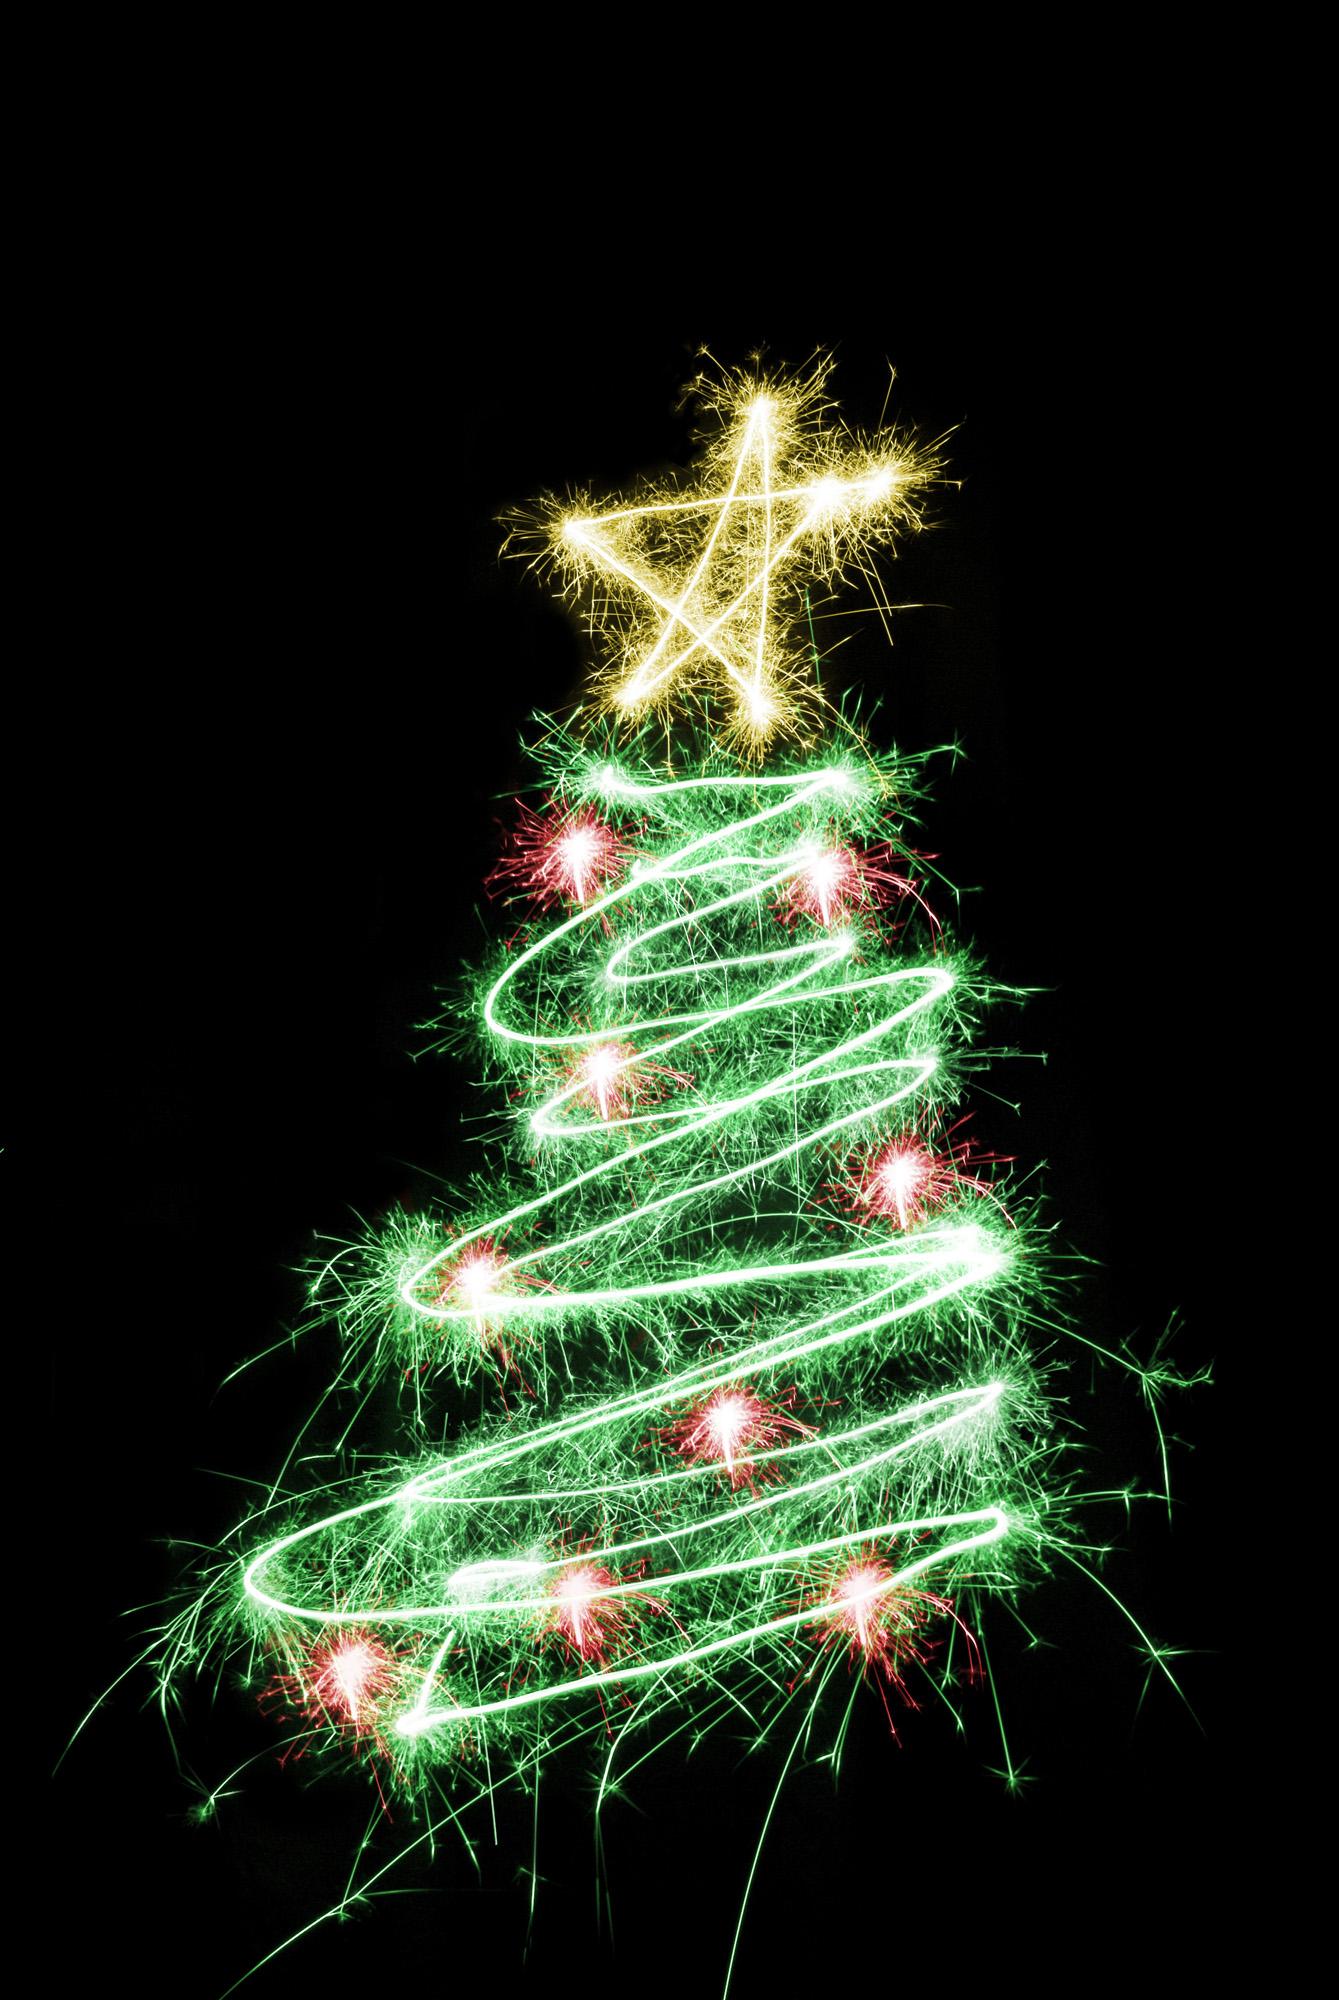 Free Stock Photo 1453-sparking xmas tree | freeimageslive